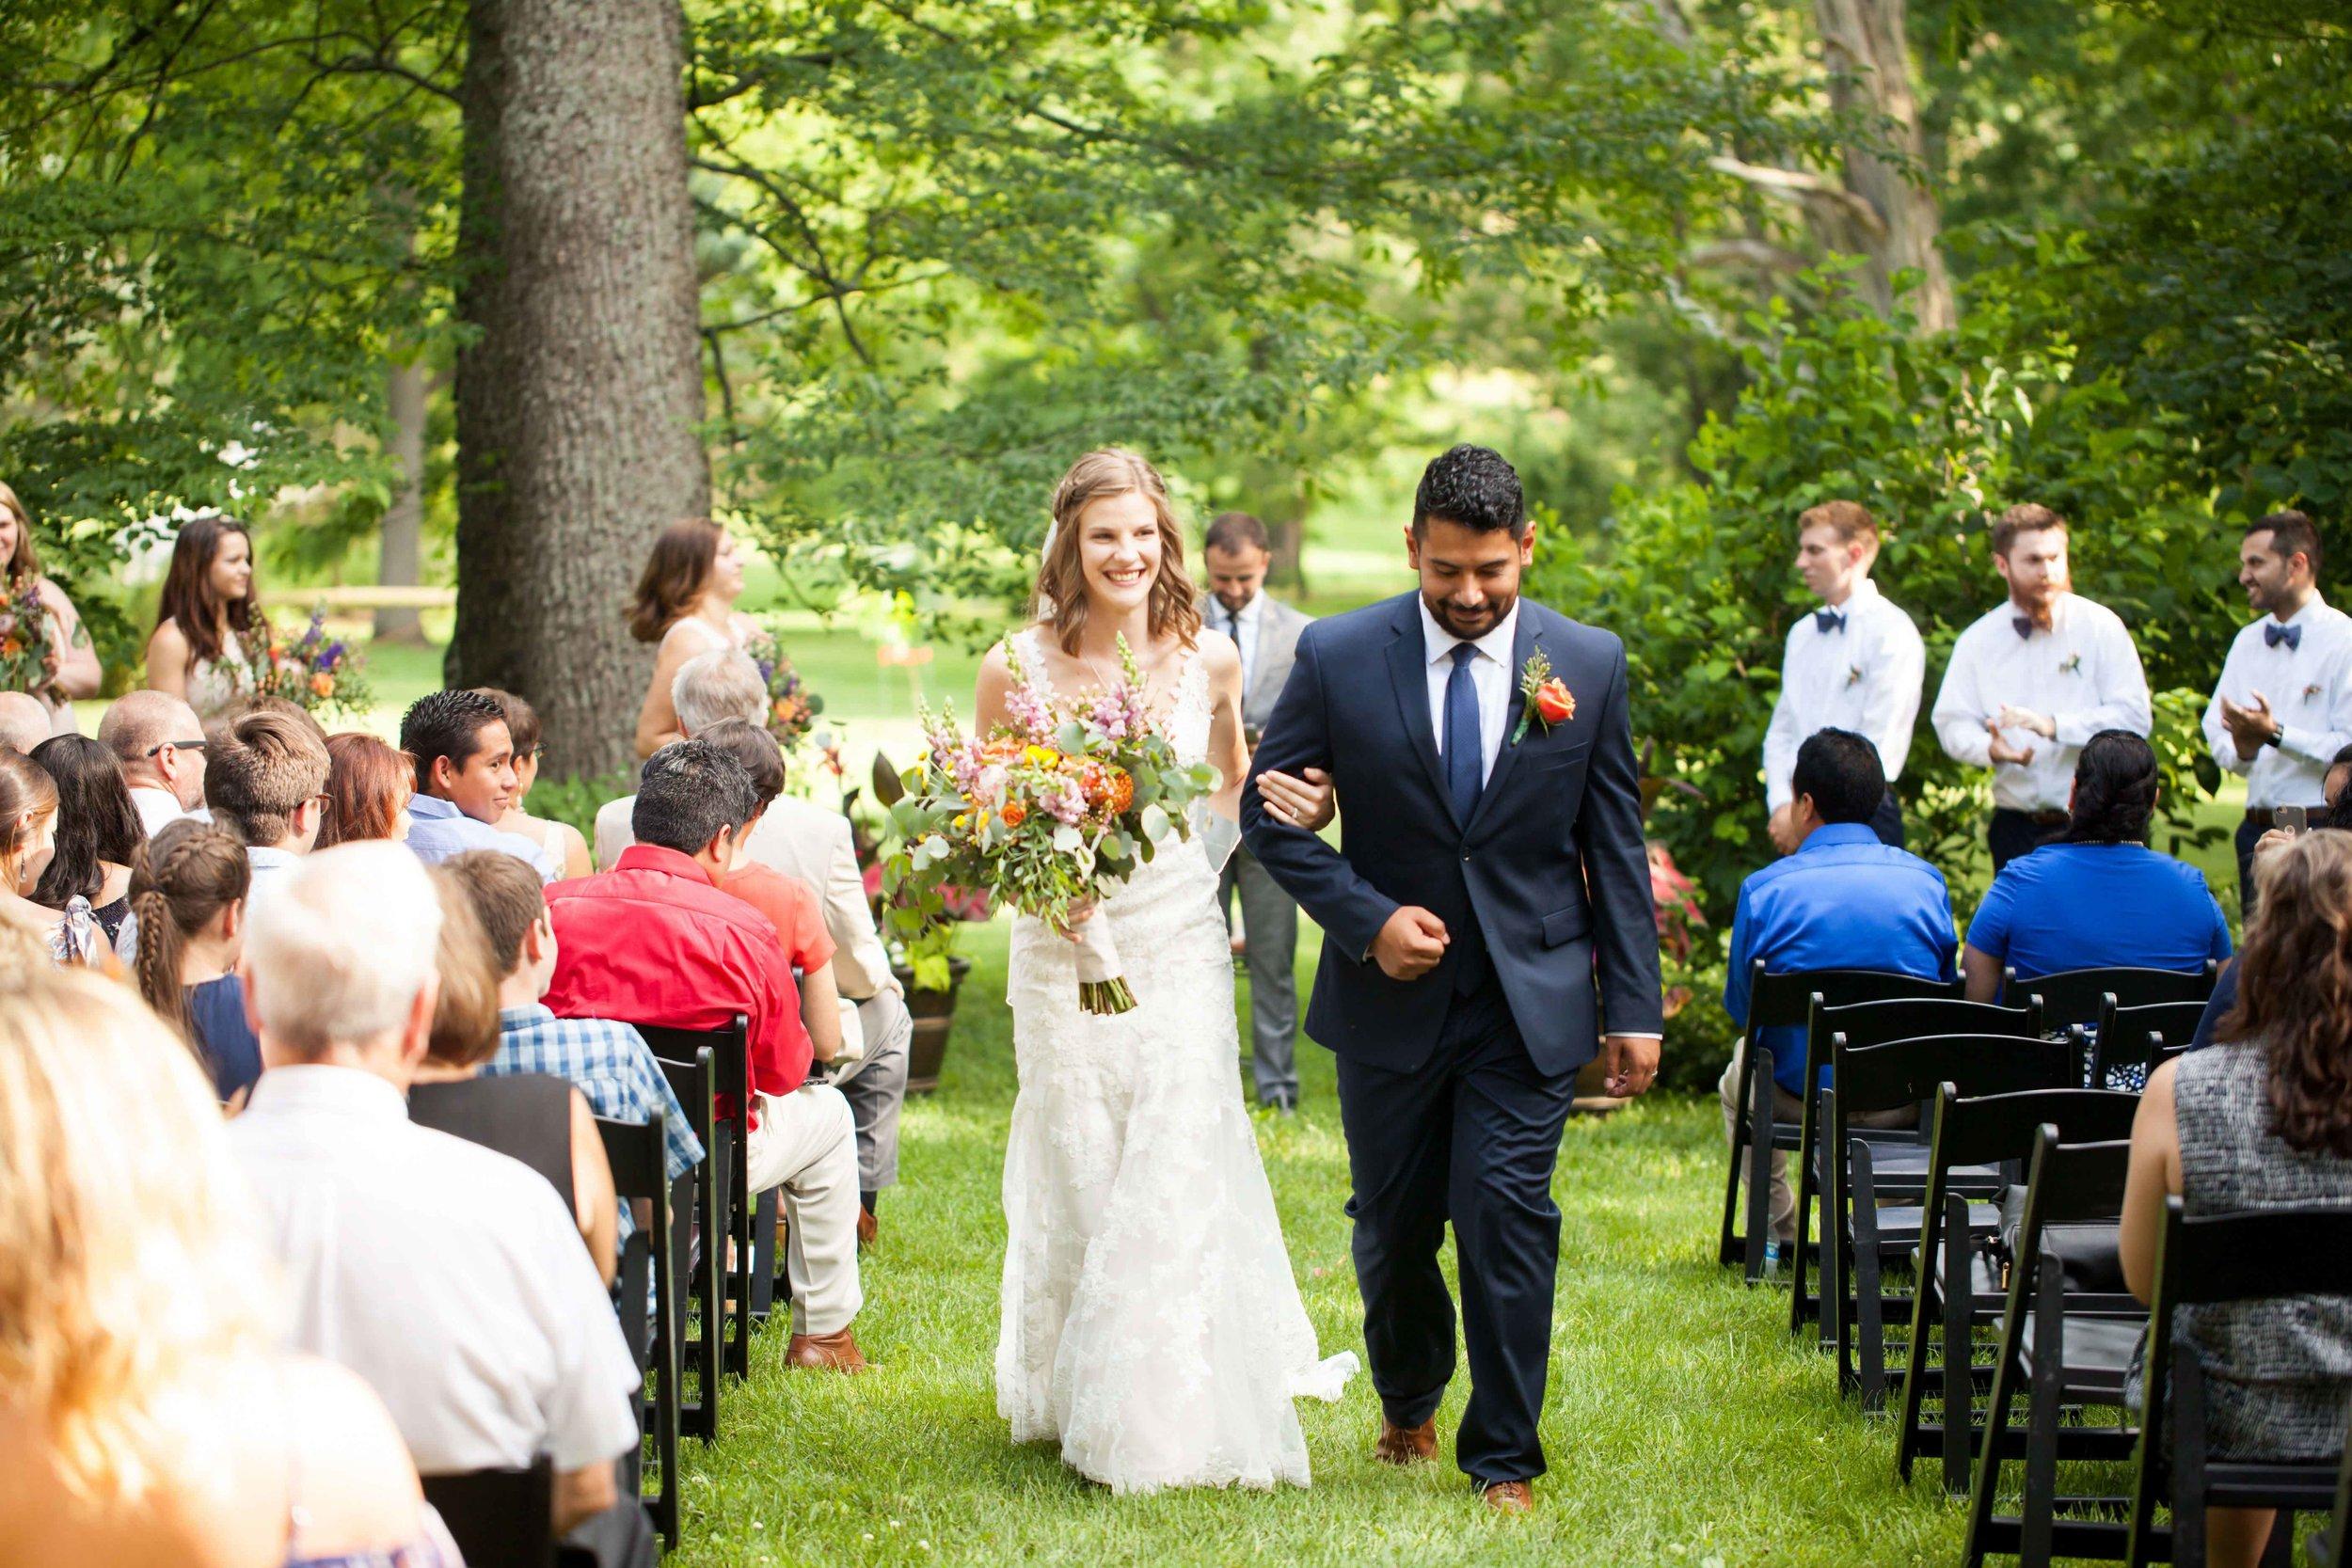 dd cincinnati wedding photographer ceremony0014.jpg